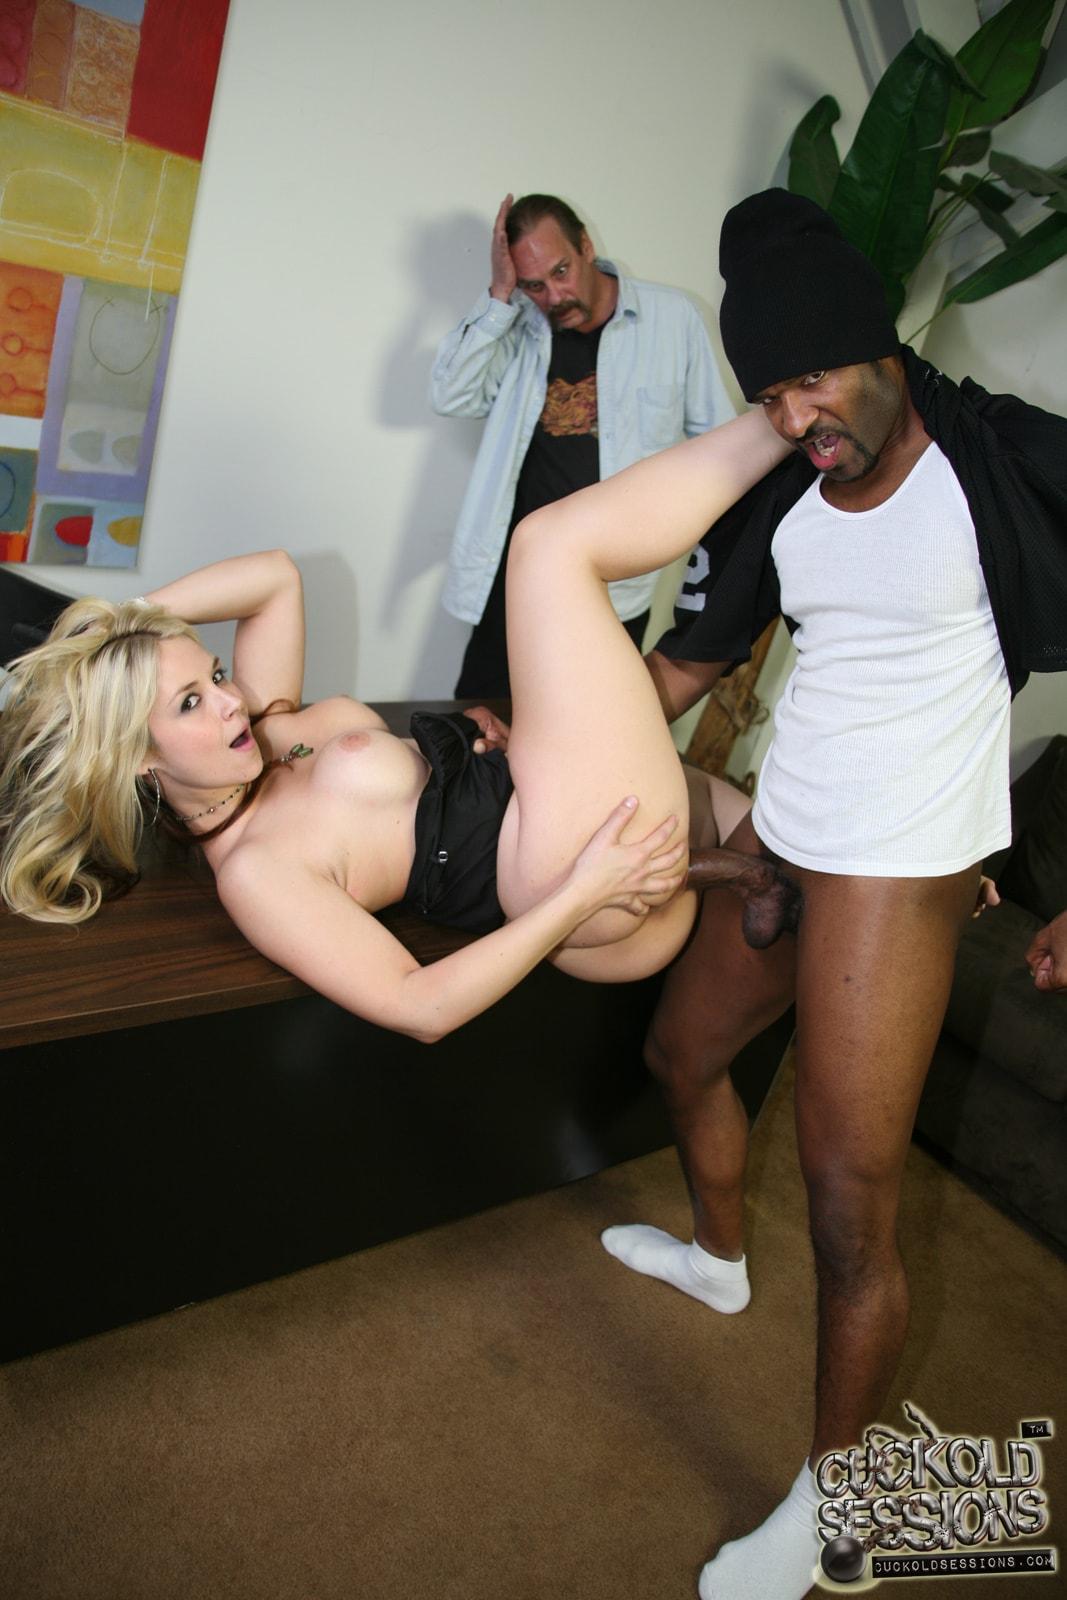 Burningangel punk babysitter rides cock pornofilme